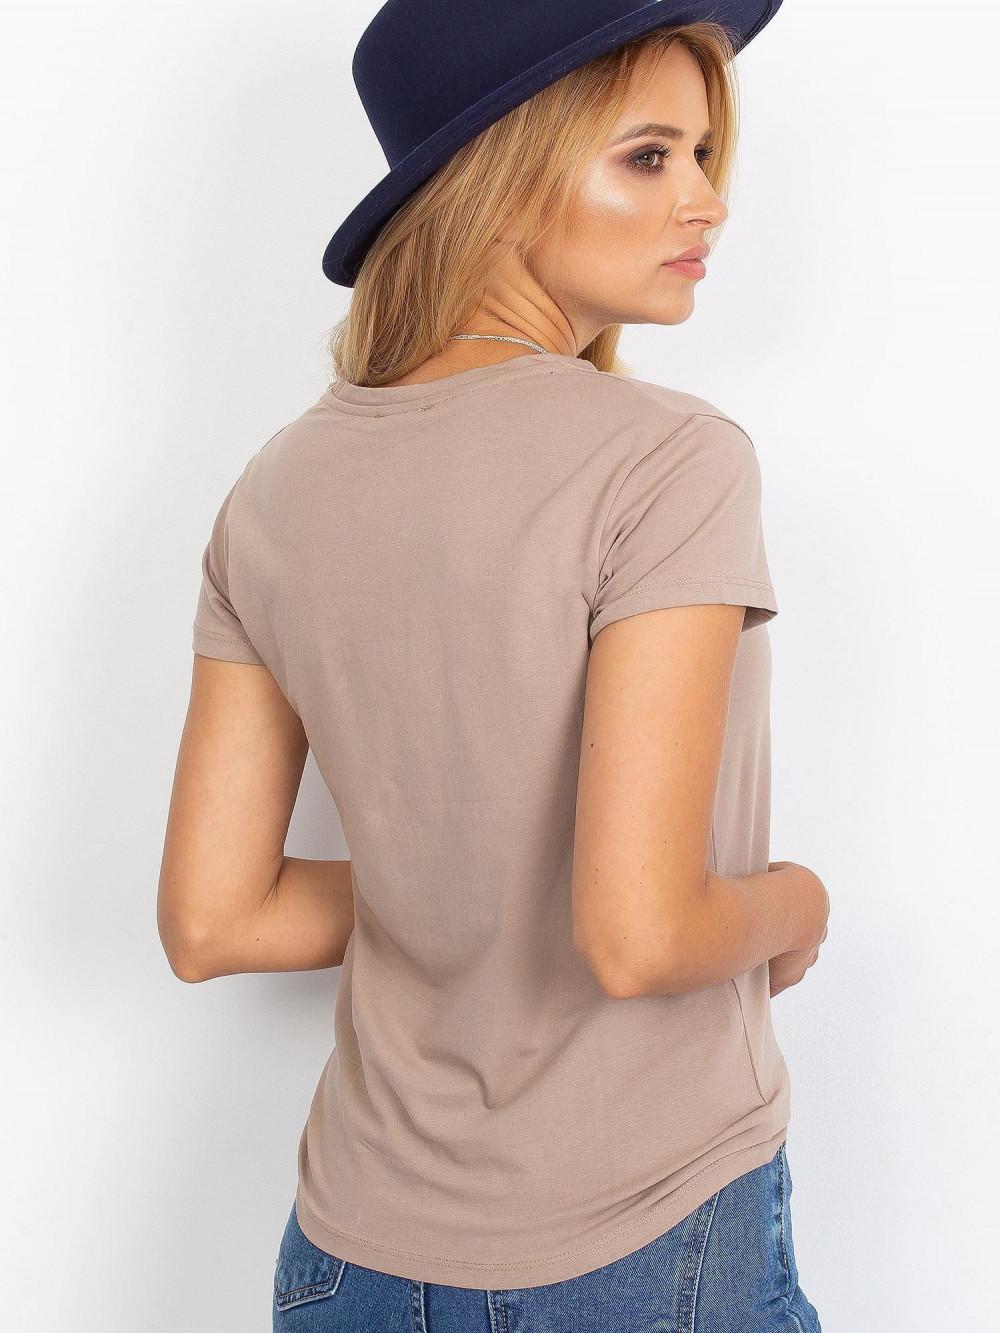 Ciemnobeżowy t-shirt O-Neck Esma 4